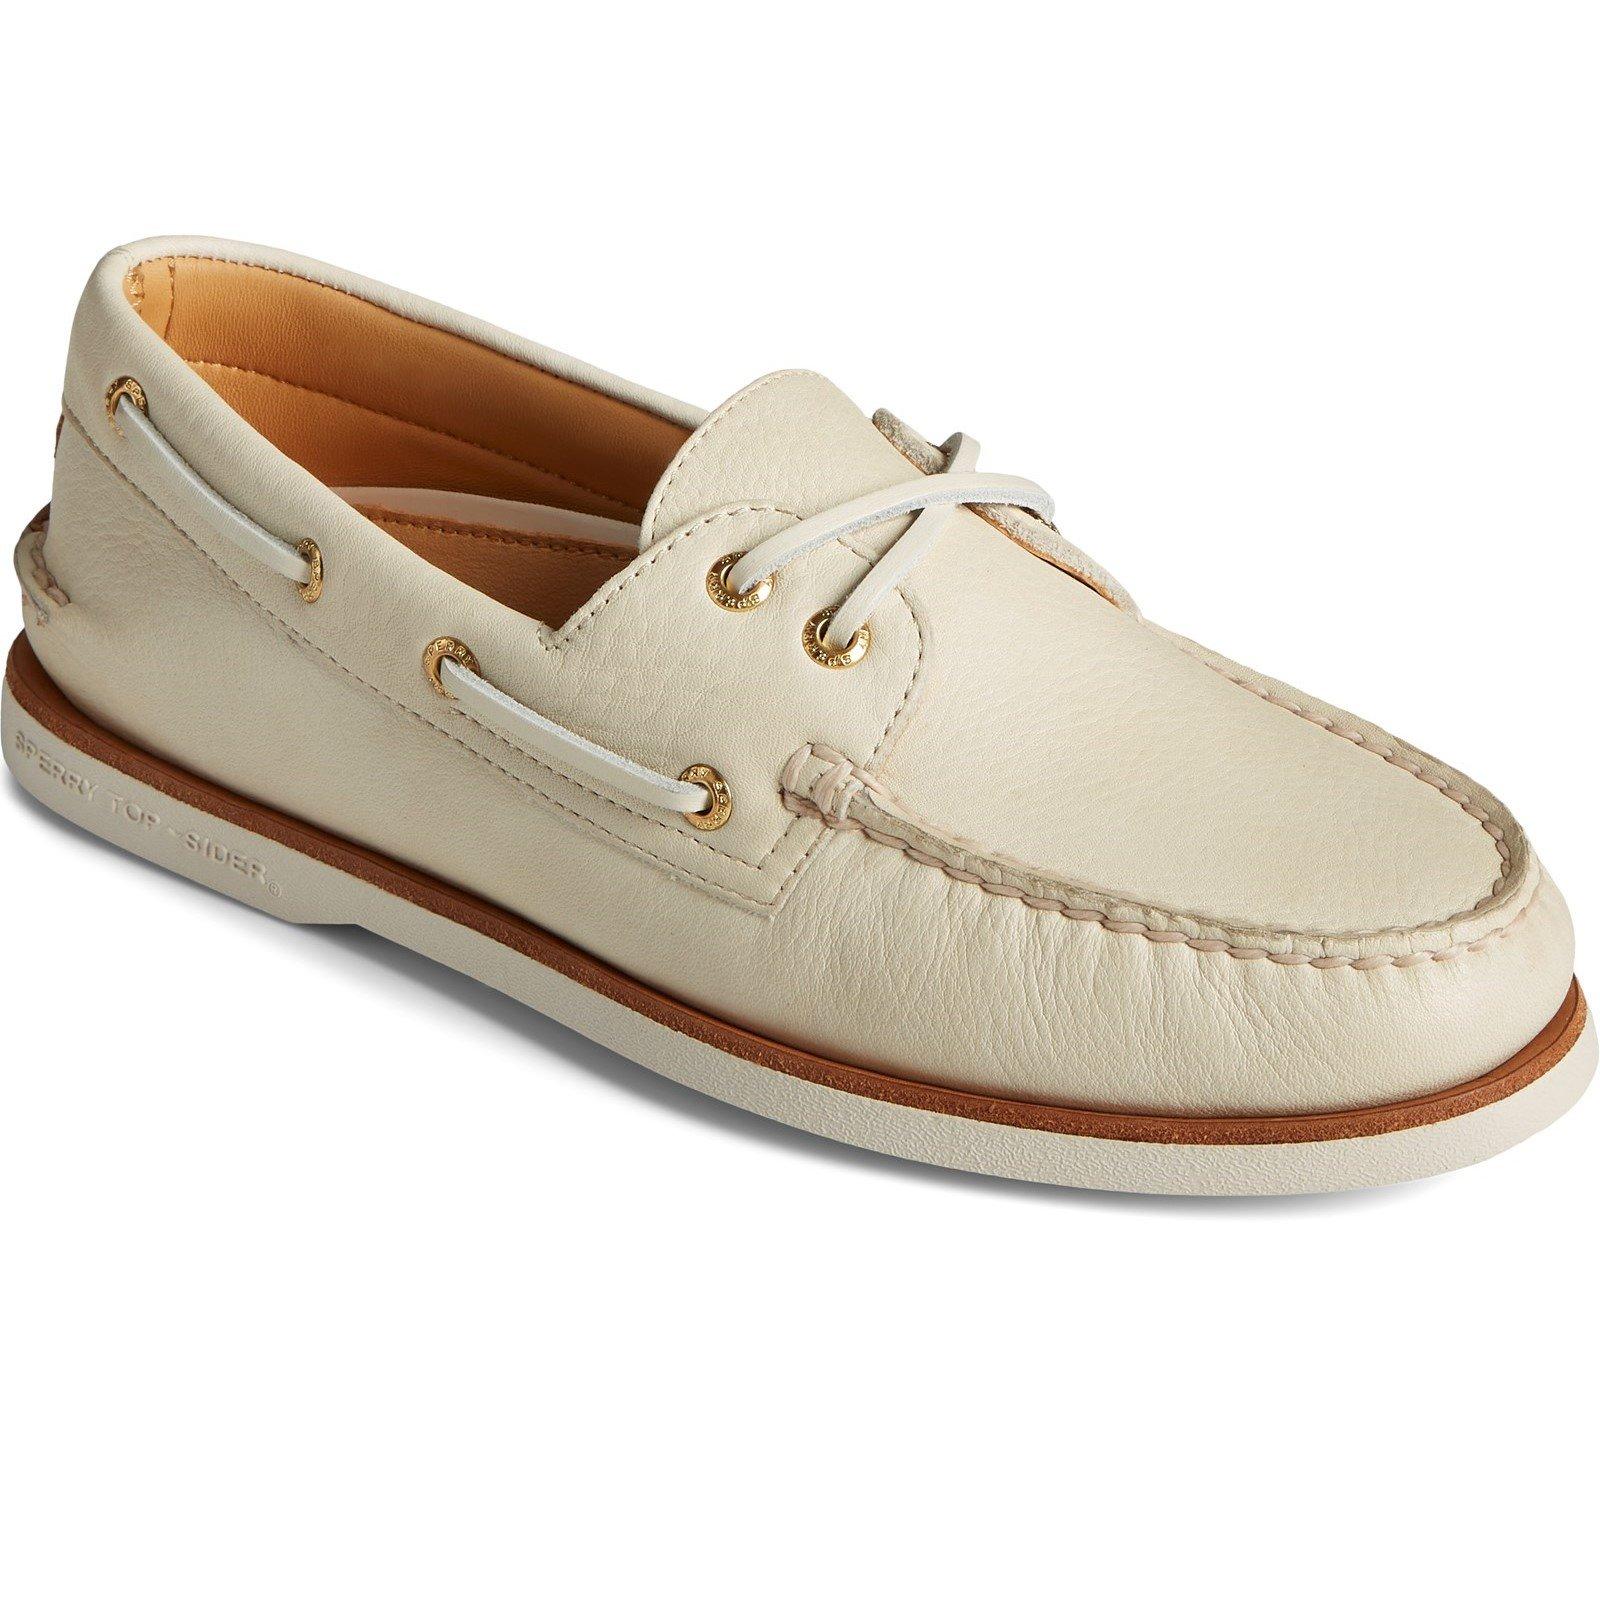 Sperry Men's A/O 2-Eye Boat Shoe Various Colours 32926 - Cream 7.5